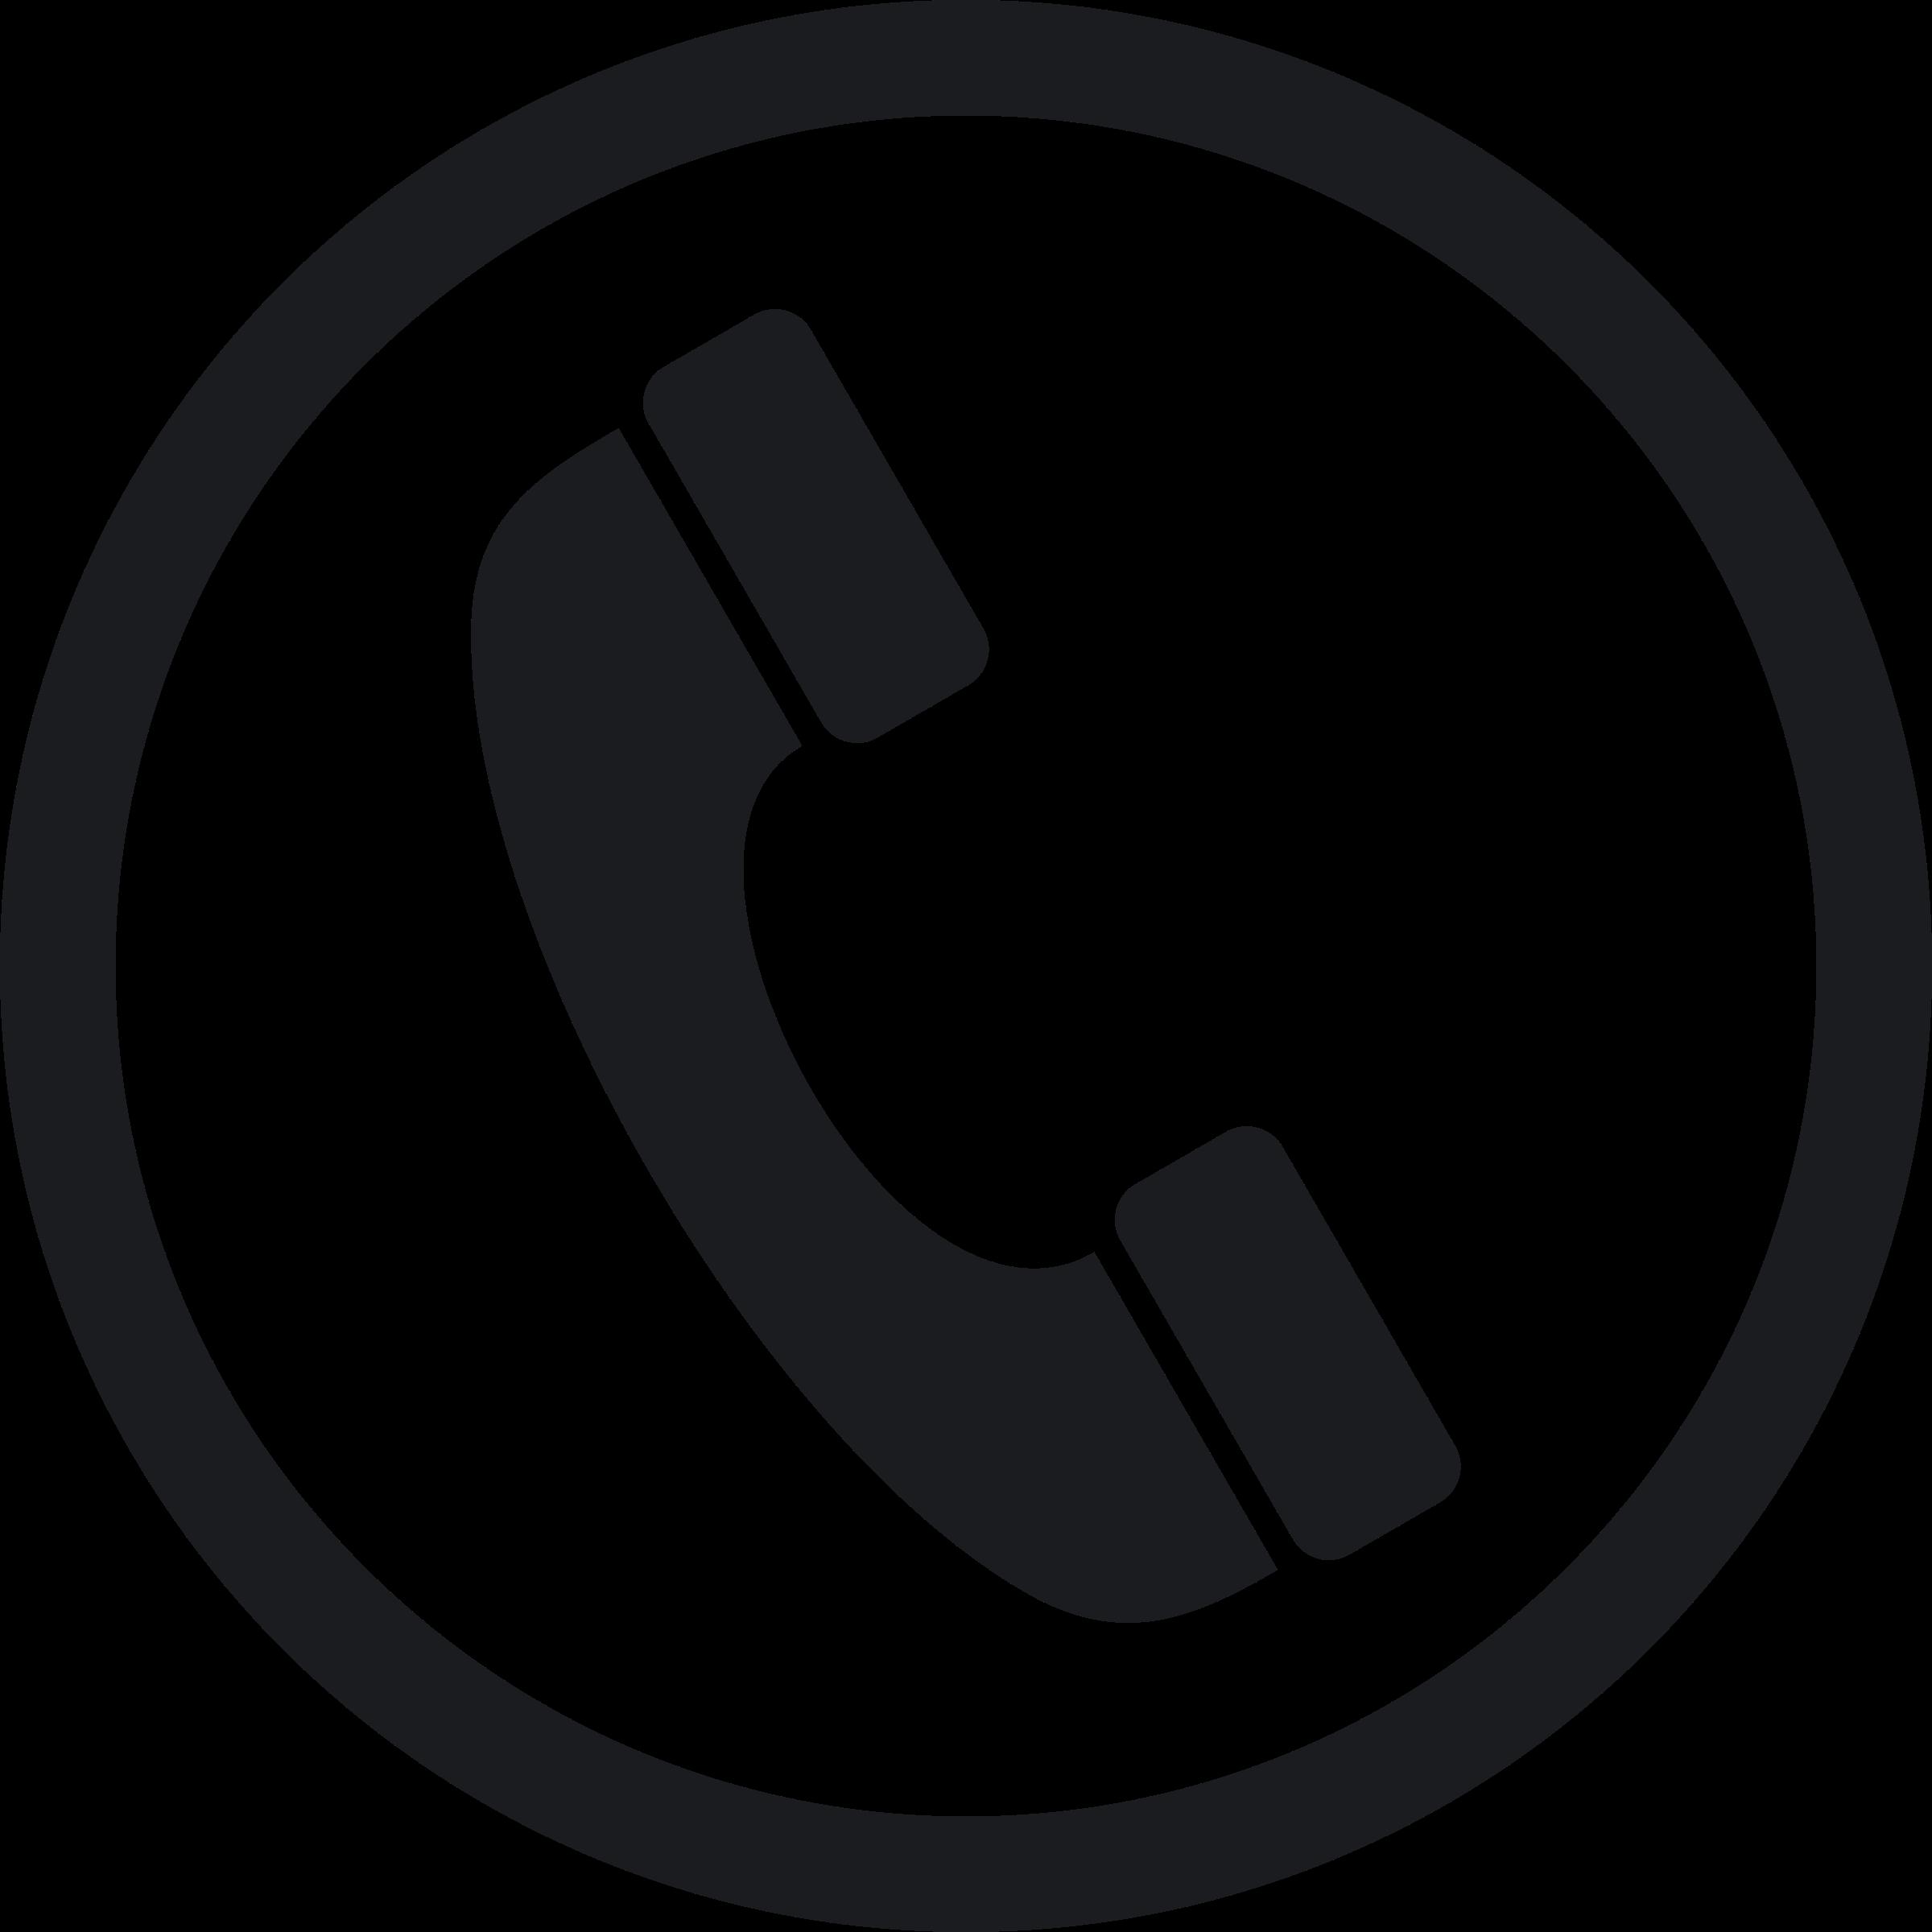 molumen-phone-icon